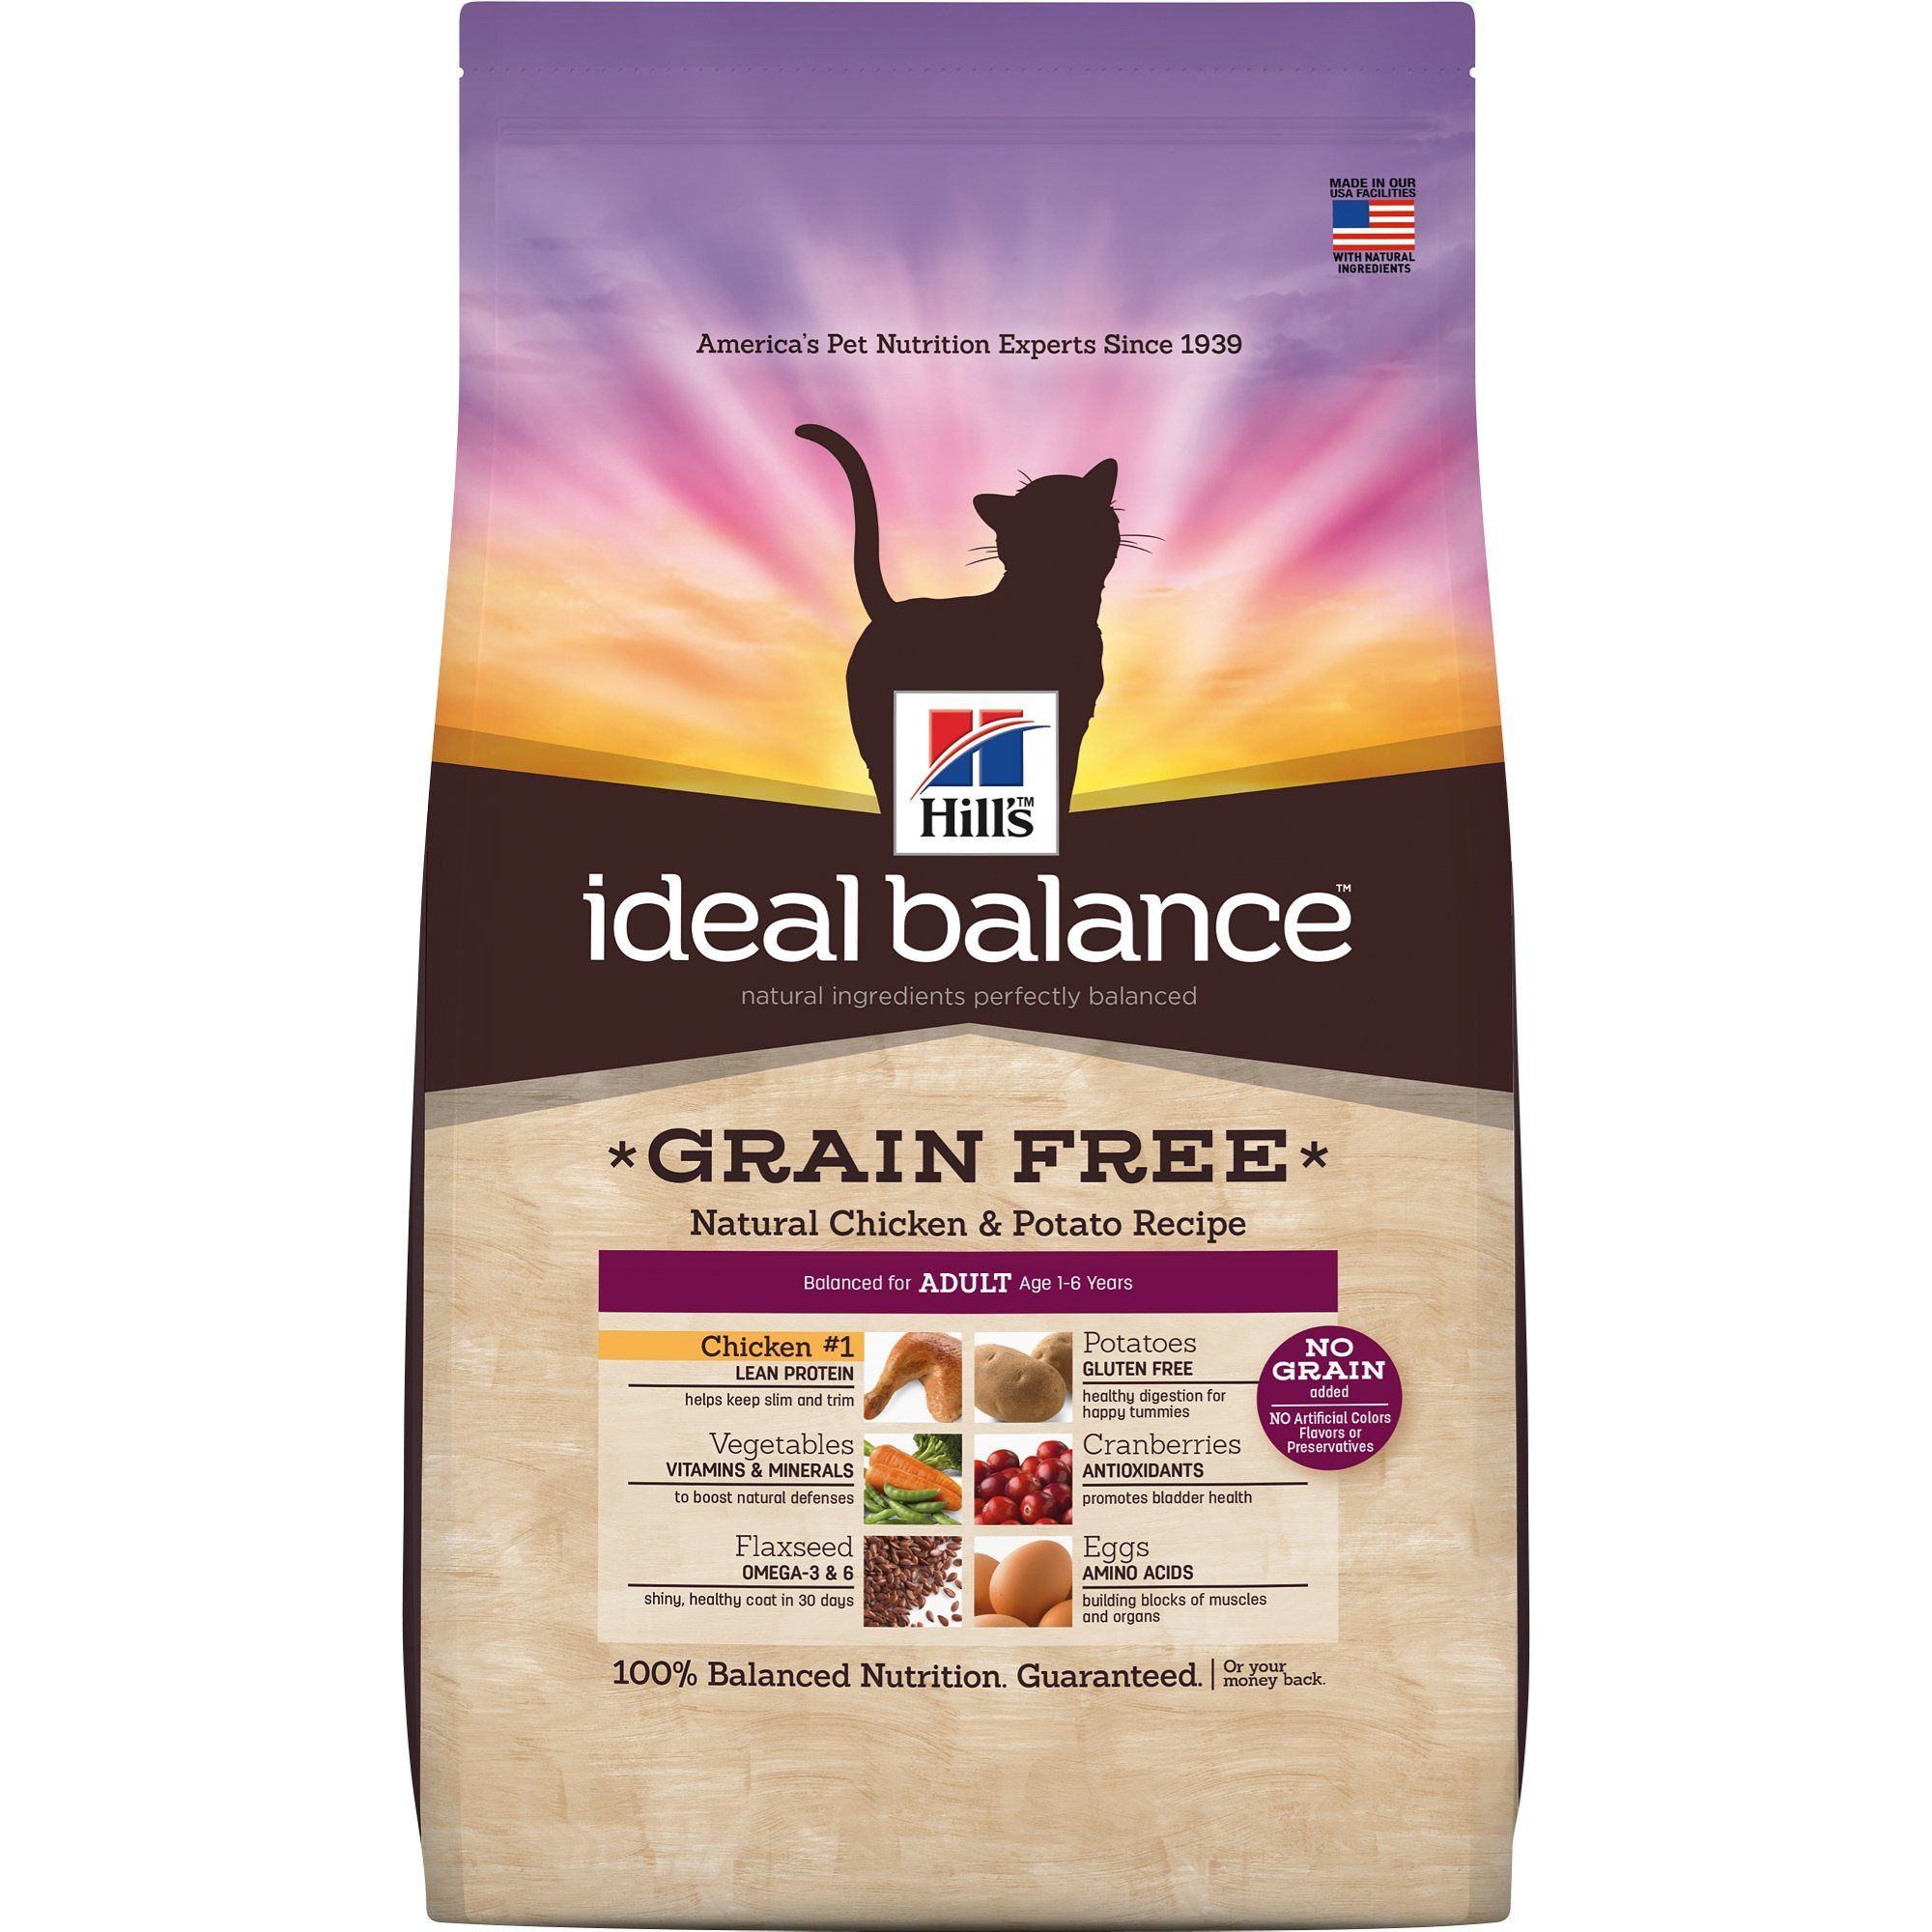 Hill'S Ideal Balance Adult Grain Free Cat Food, Natural Chicken & Potato Recipe Dry Cat Food, 11 Lb Bag